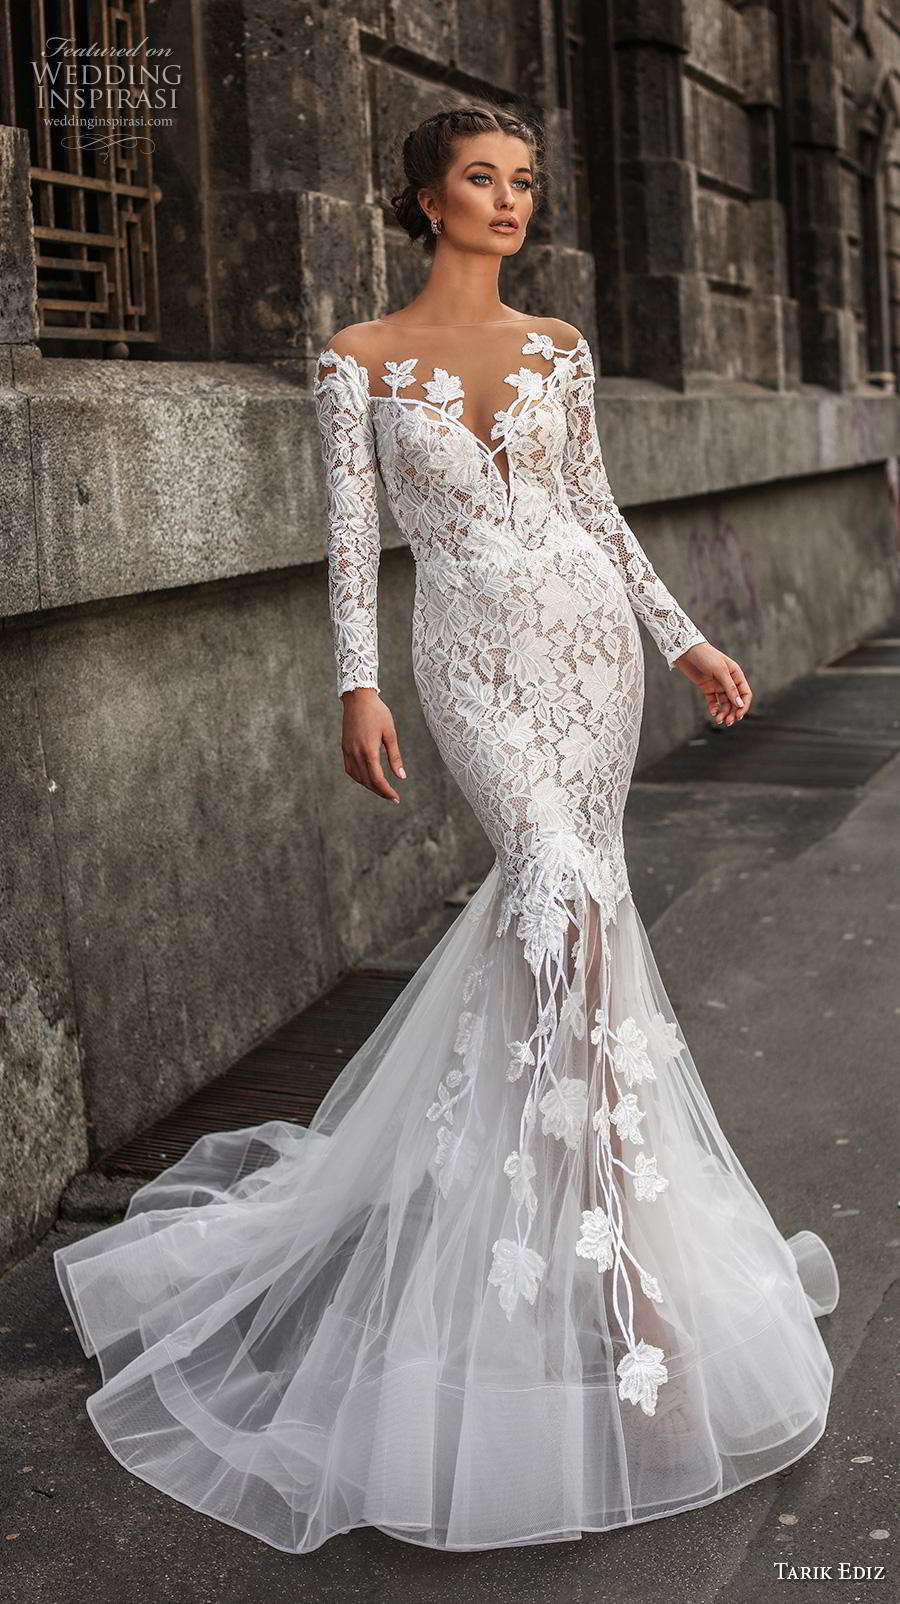 tarik ediz 2019 bridal long sleeves sheer bateau deep sweetheart neckline heavily embellished bodice elegant mermaid wedding dress lace button back chapel train (20) mv